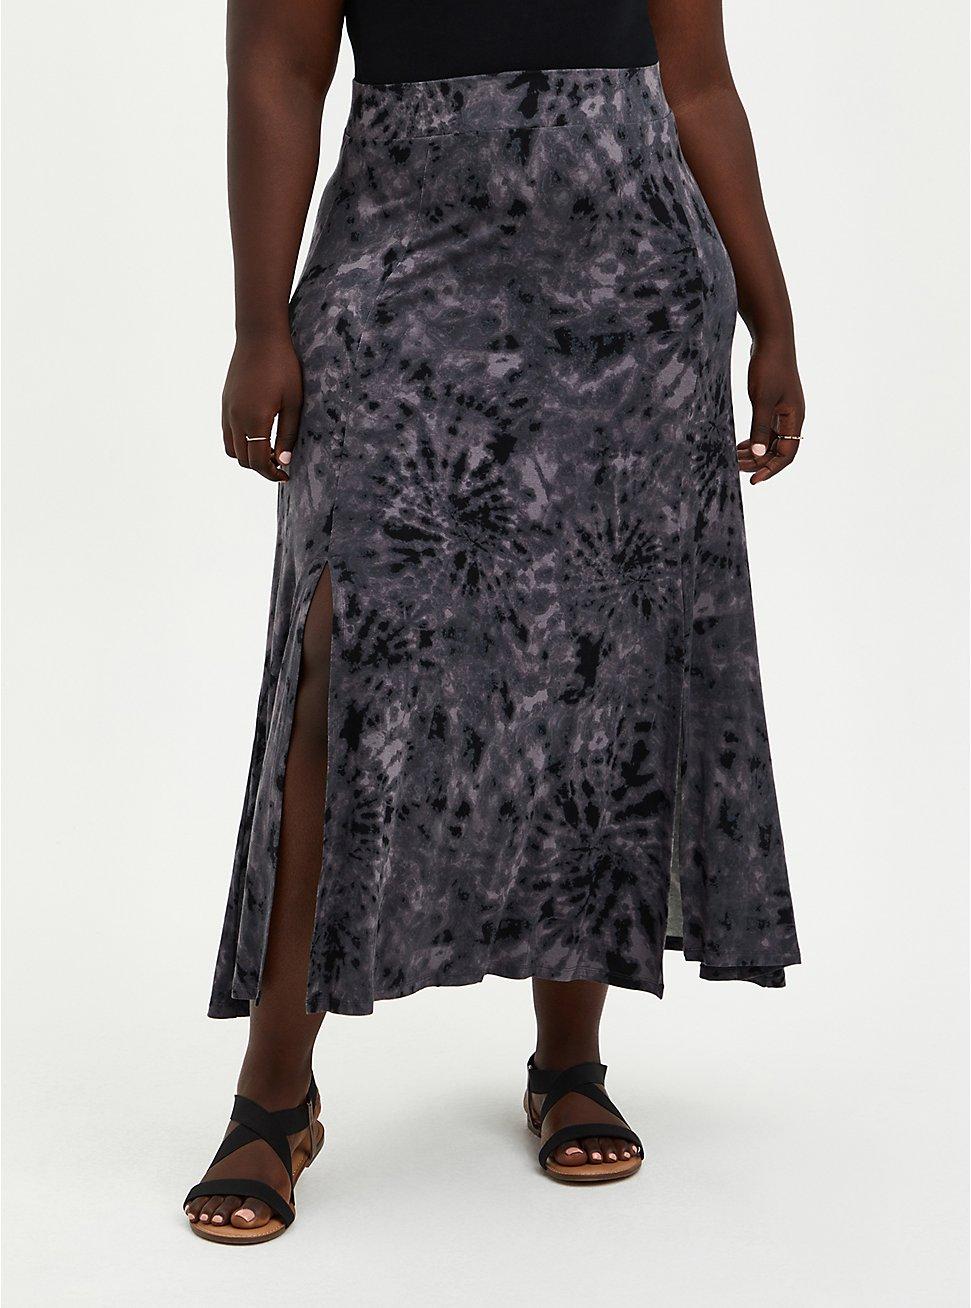 Black Tie-Dye Jersey Side Slit Maxi Skirt, TIE DYE, hi-res